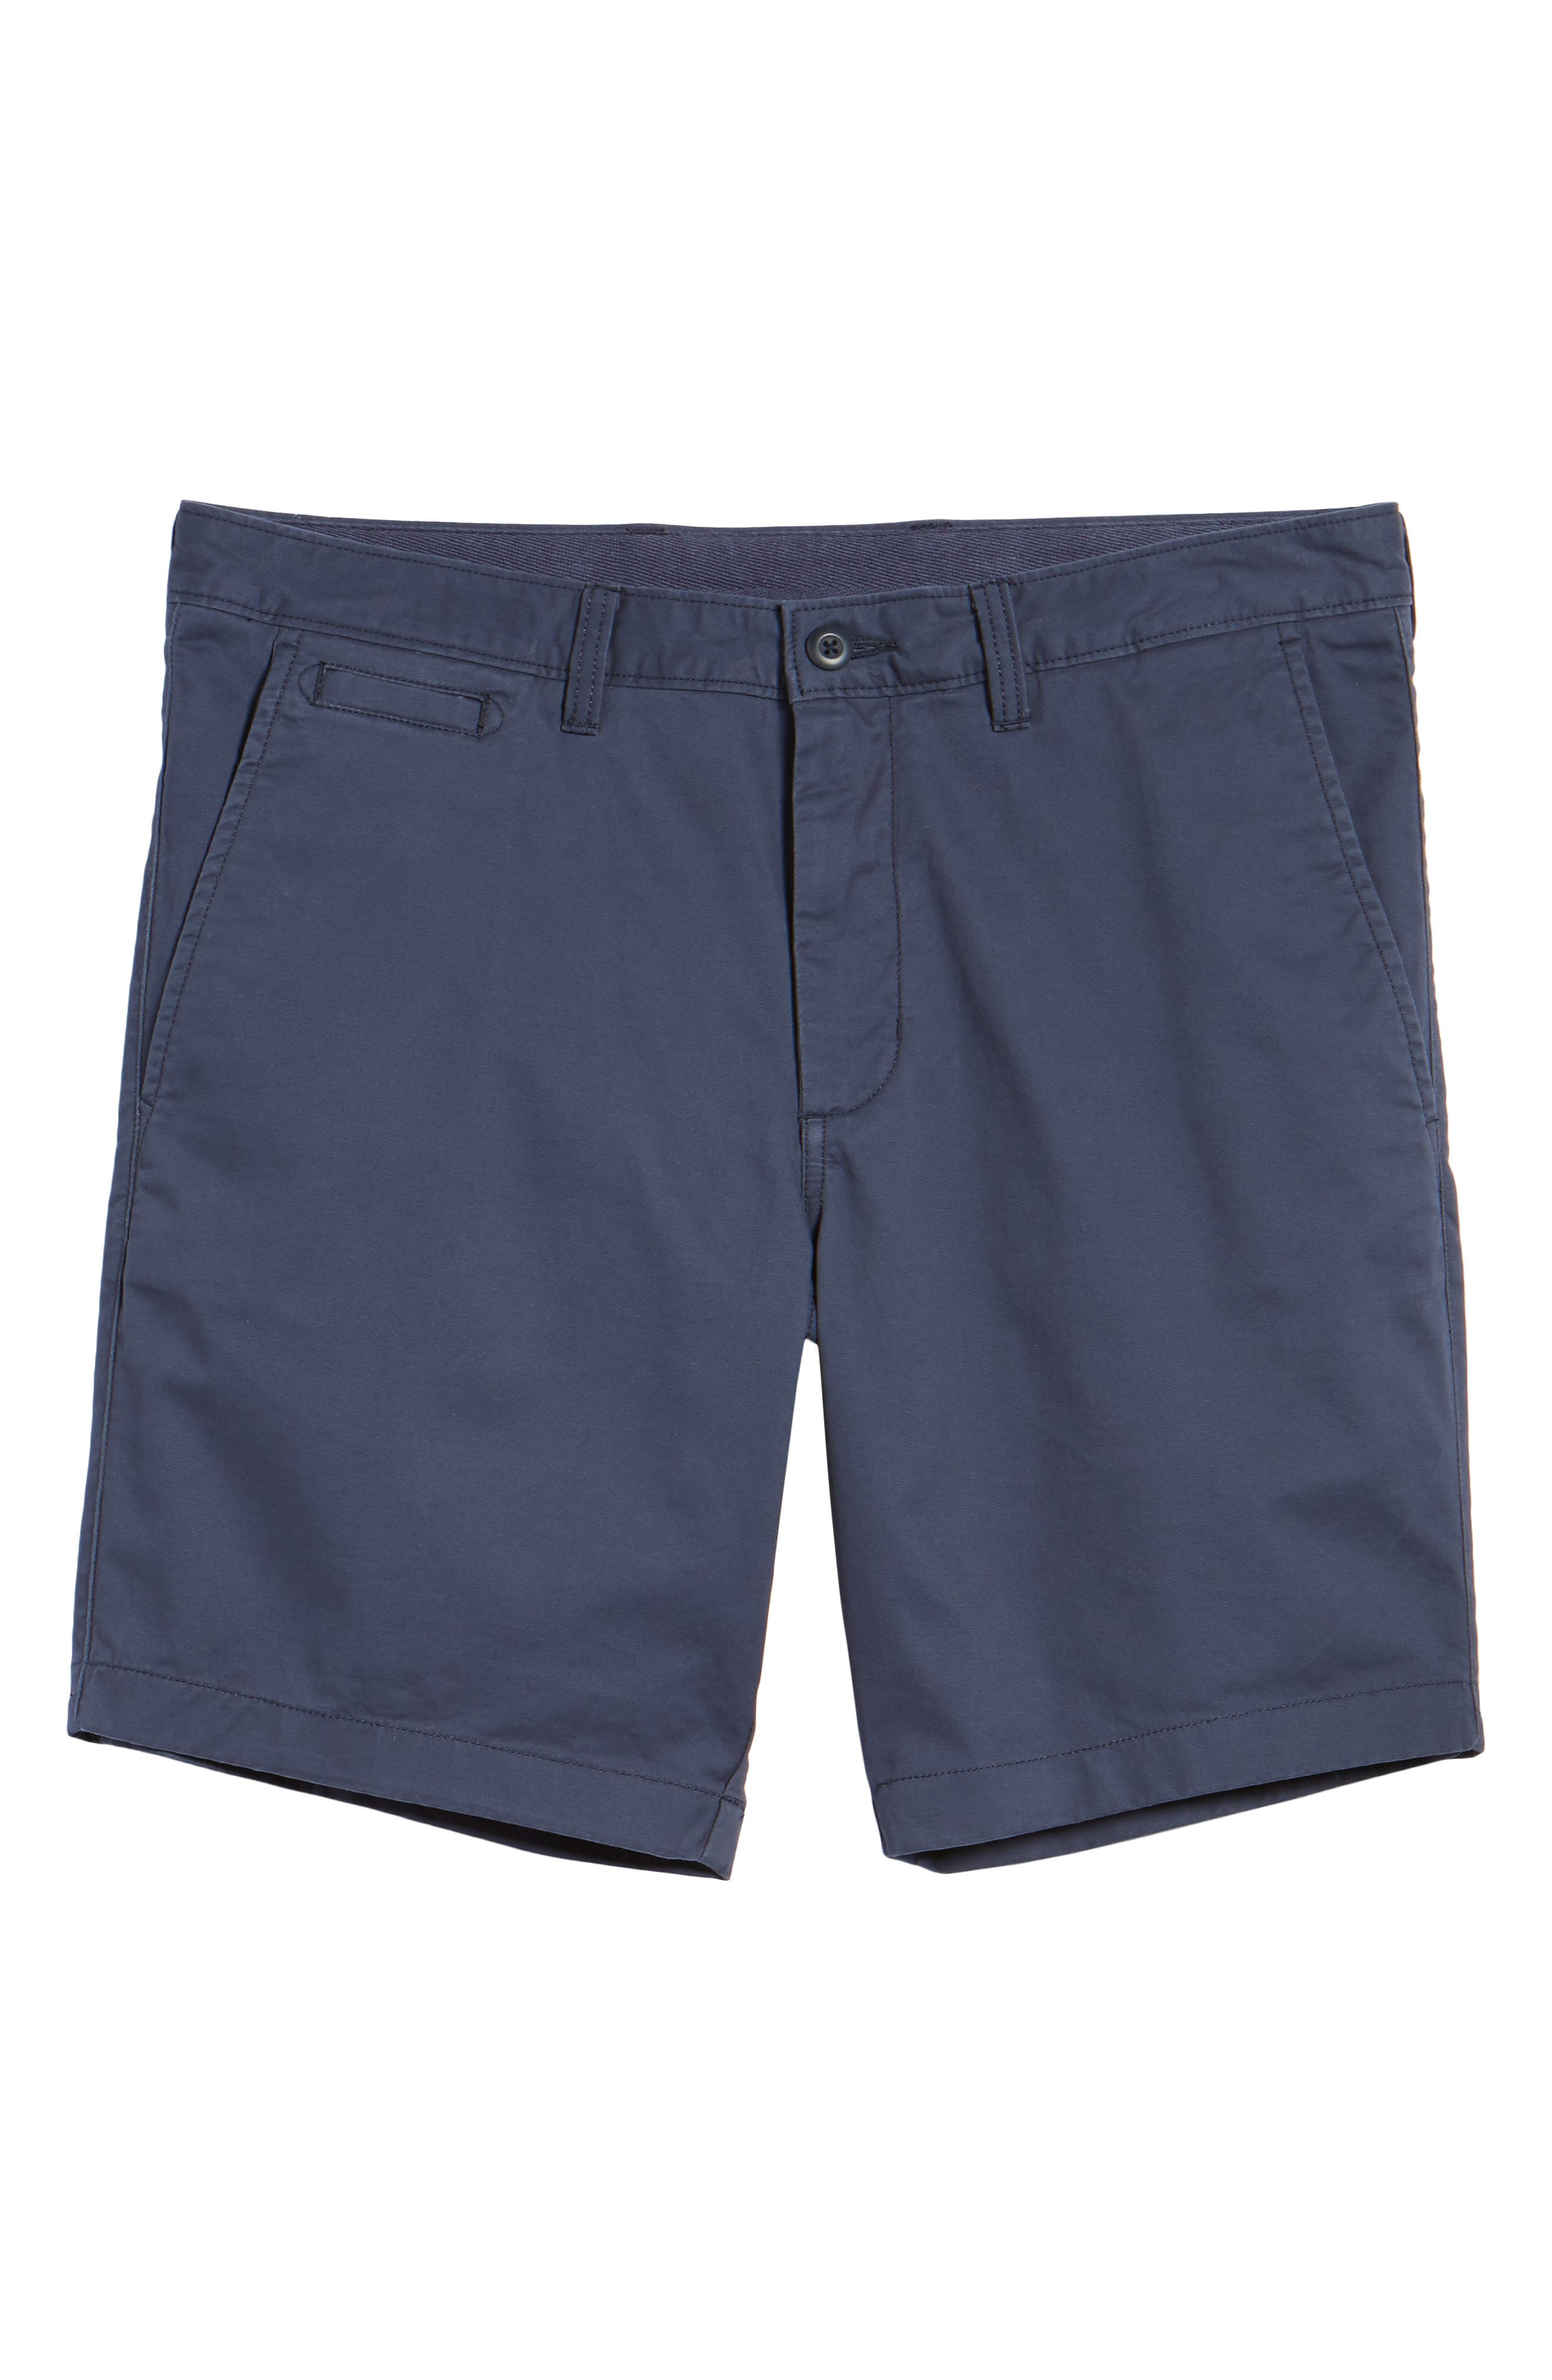 Ballard Slim Fit Stretch Chino 9-Inch Shorts,                             Alternate thumbnail 67, color,